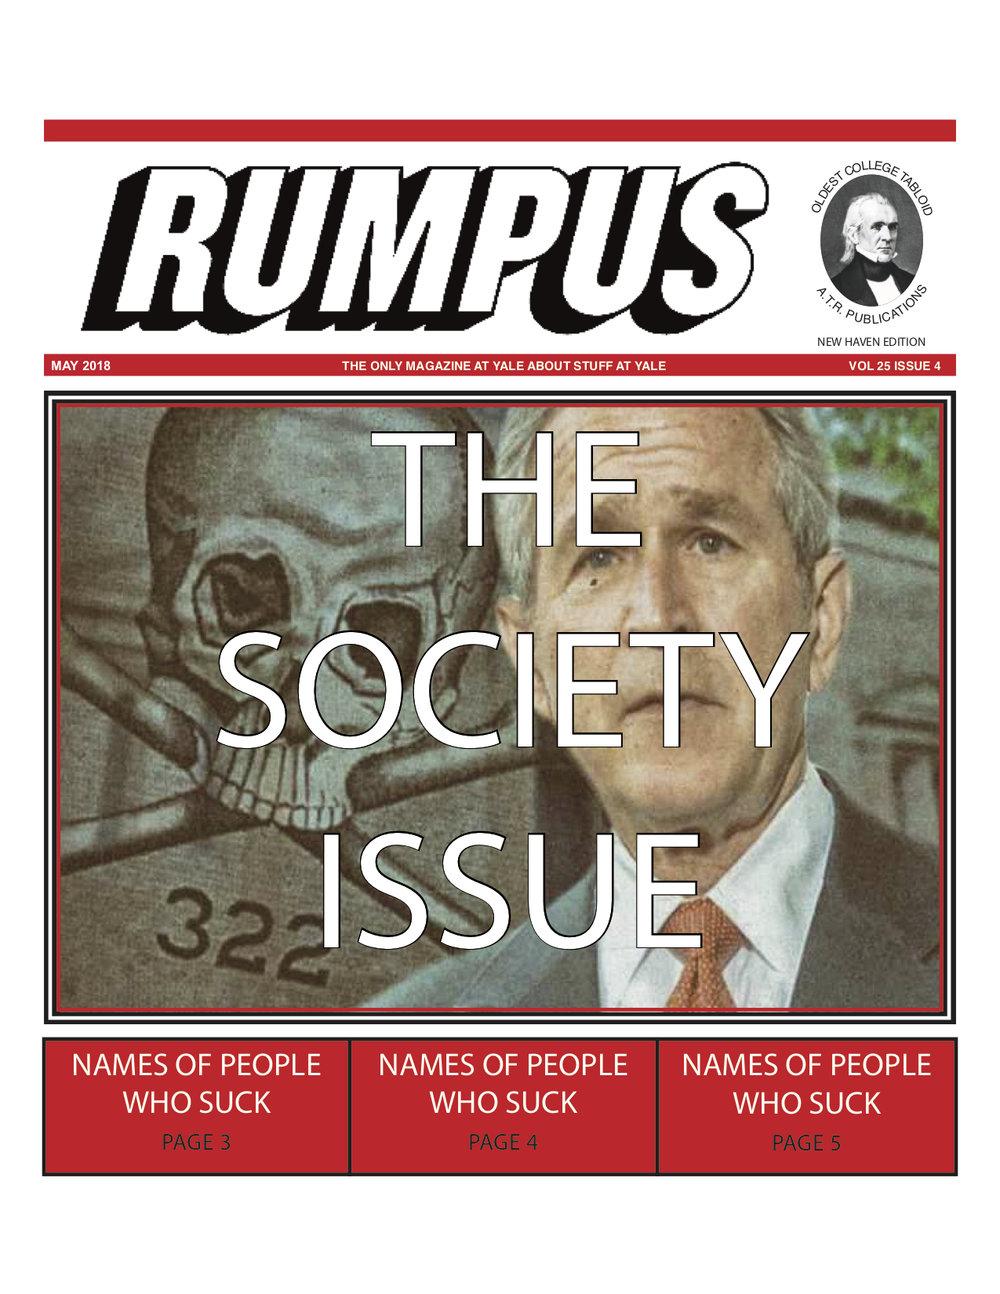 SOCIETY ISSUE 2018